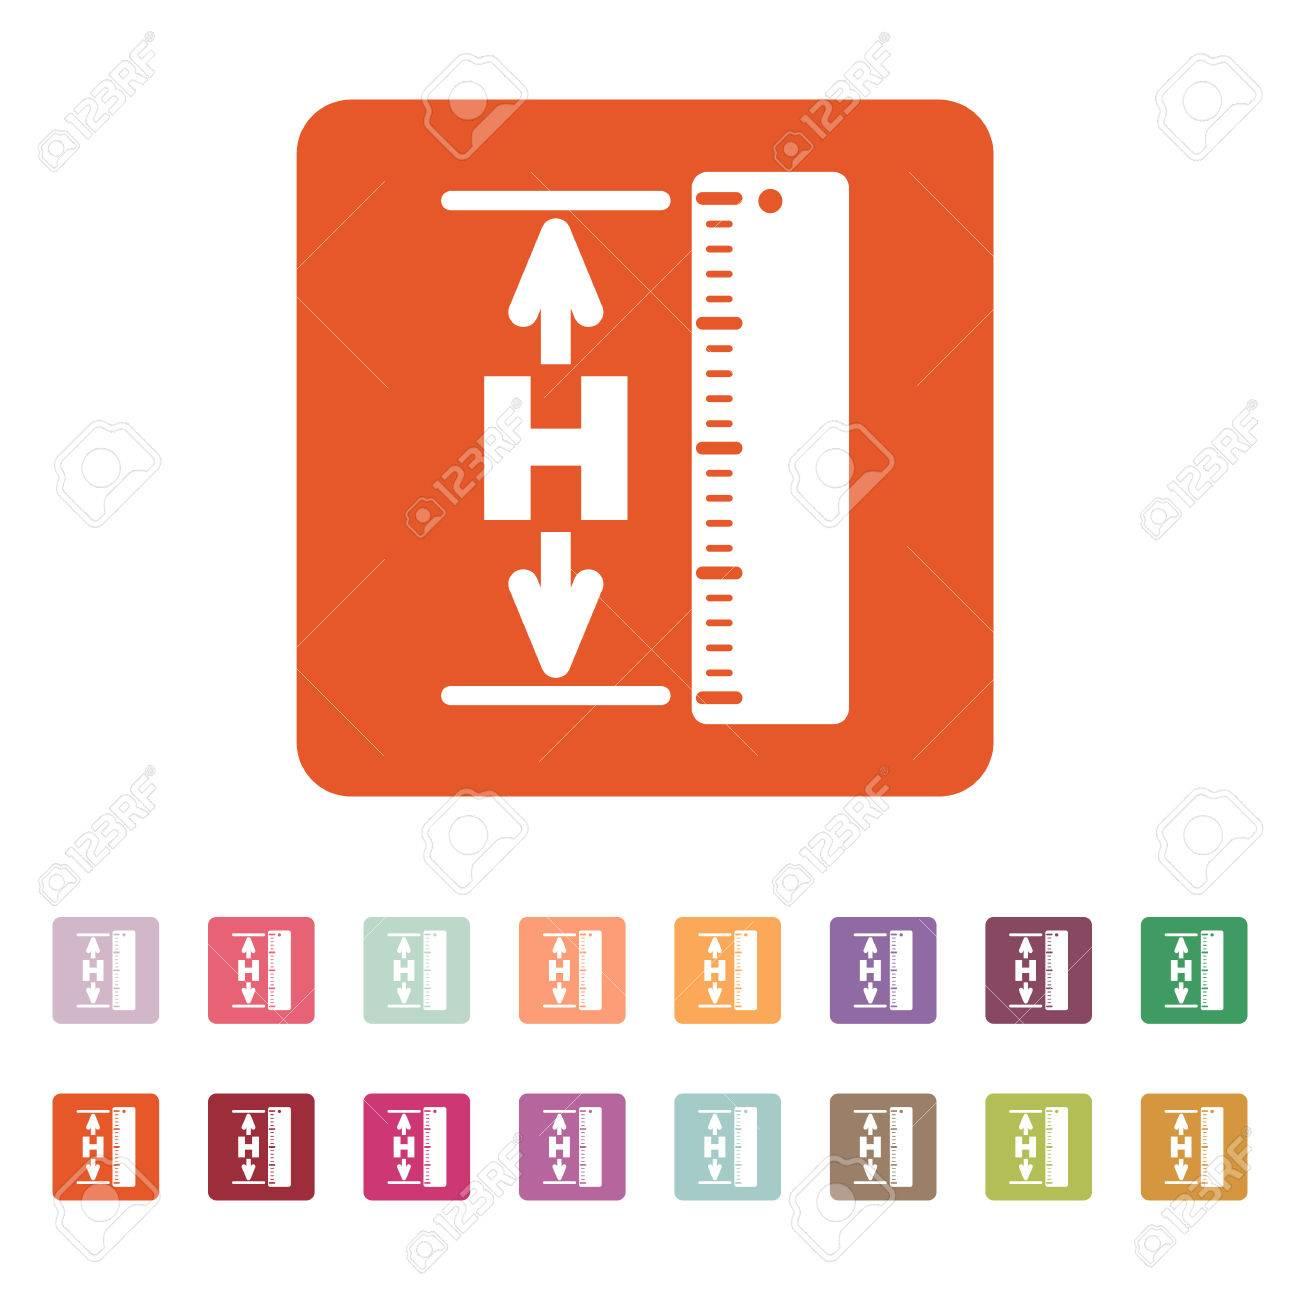 The Height Icon Altitude Elevation Level Hgt Symbol Flat - Altitude elevation